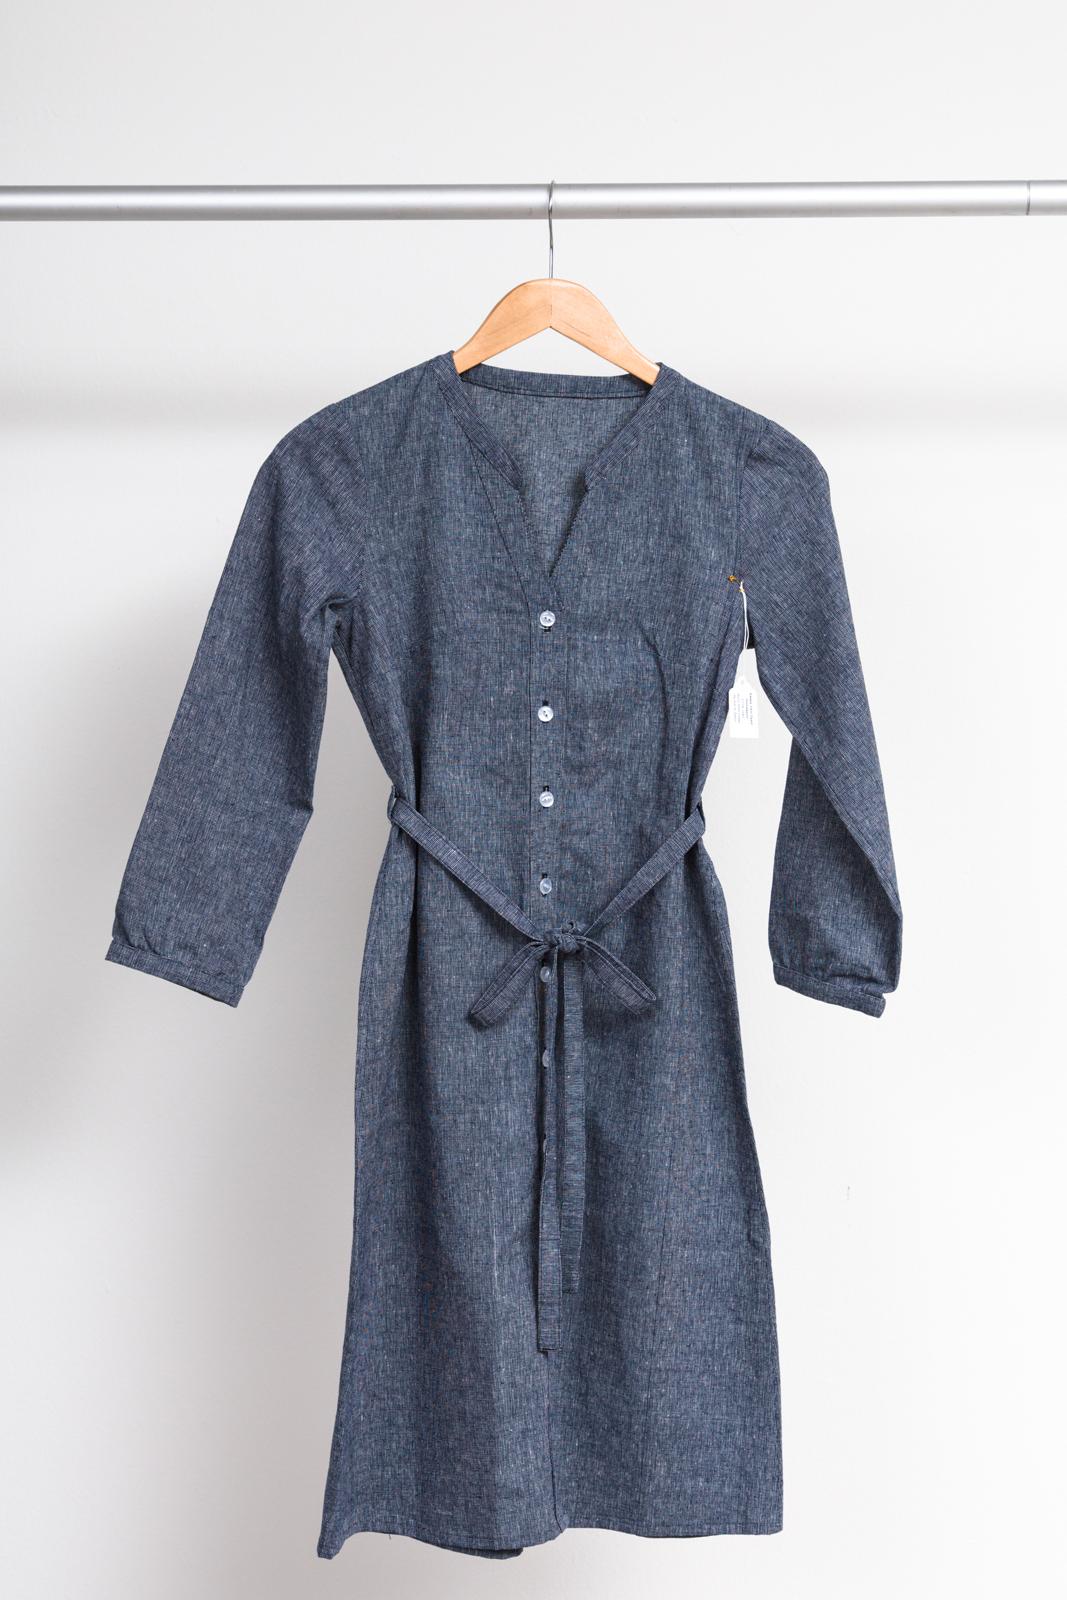 BONN SHIRT DRESS  BY  ITCH TO STITCH,   ESSEX YARN DYED HOMESPUN